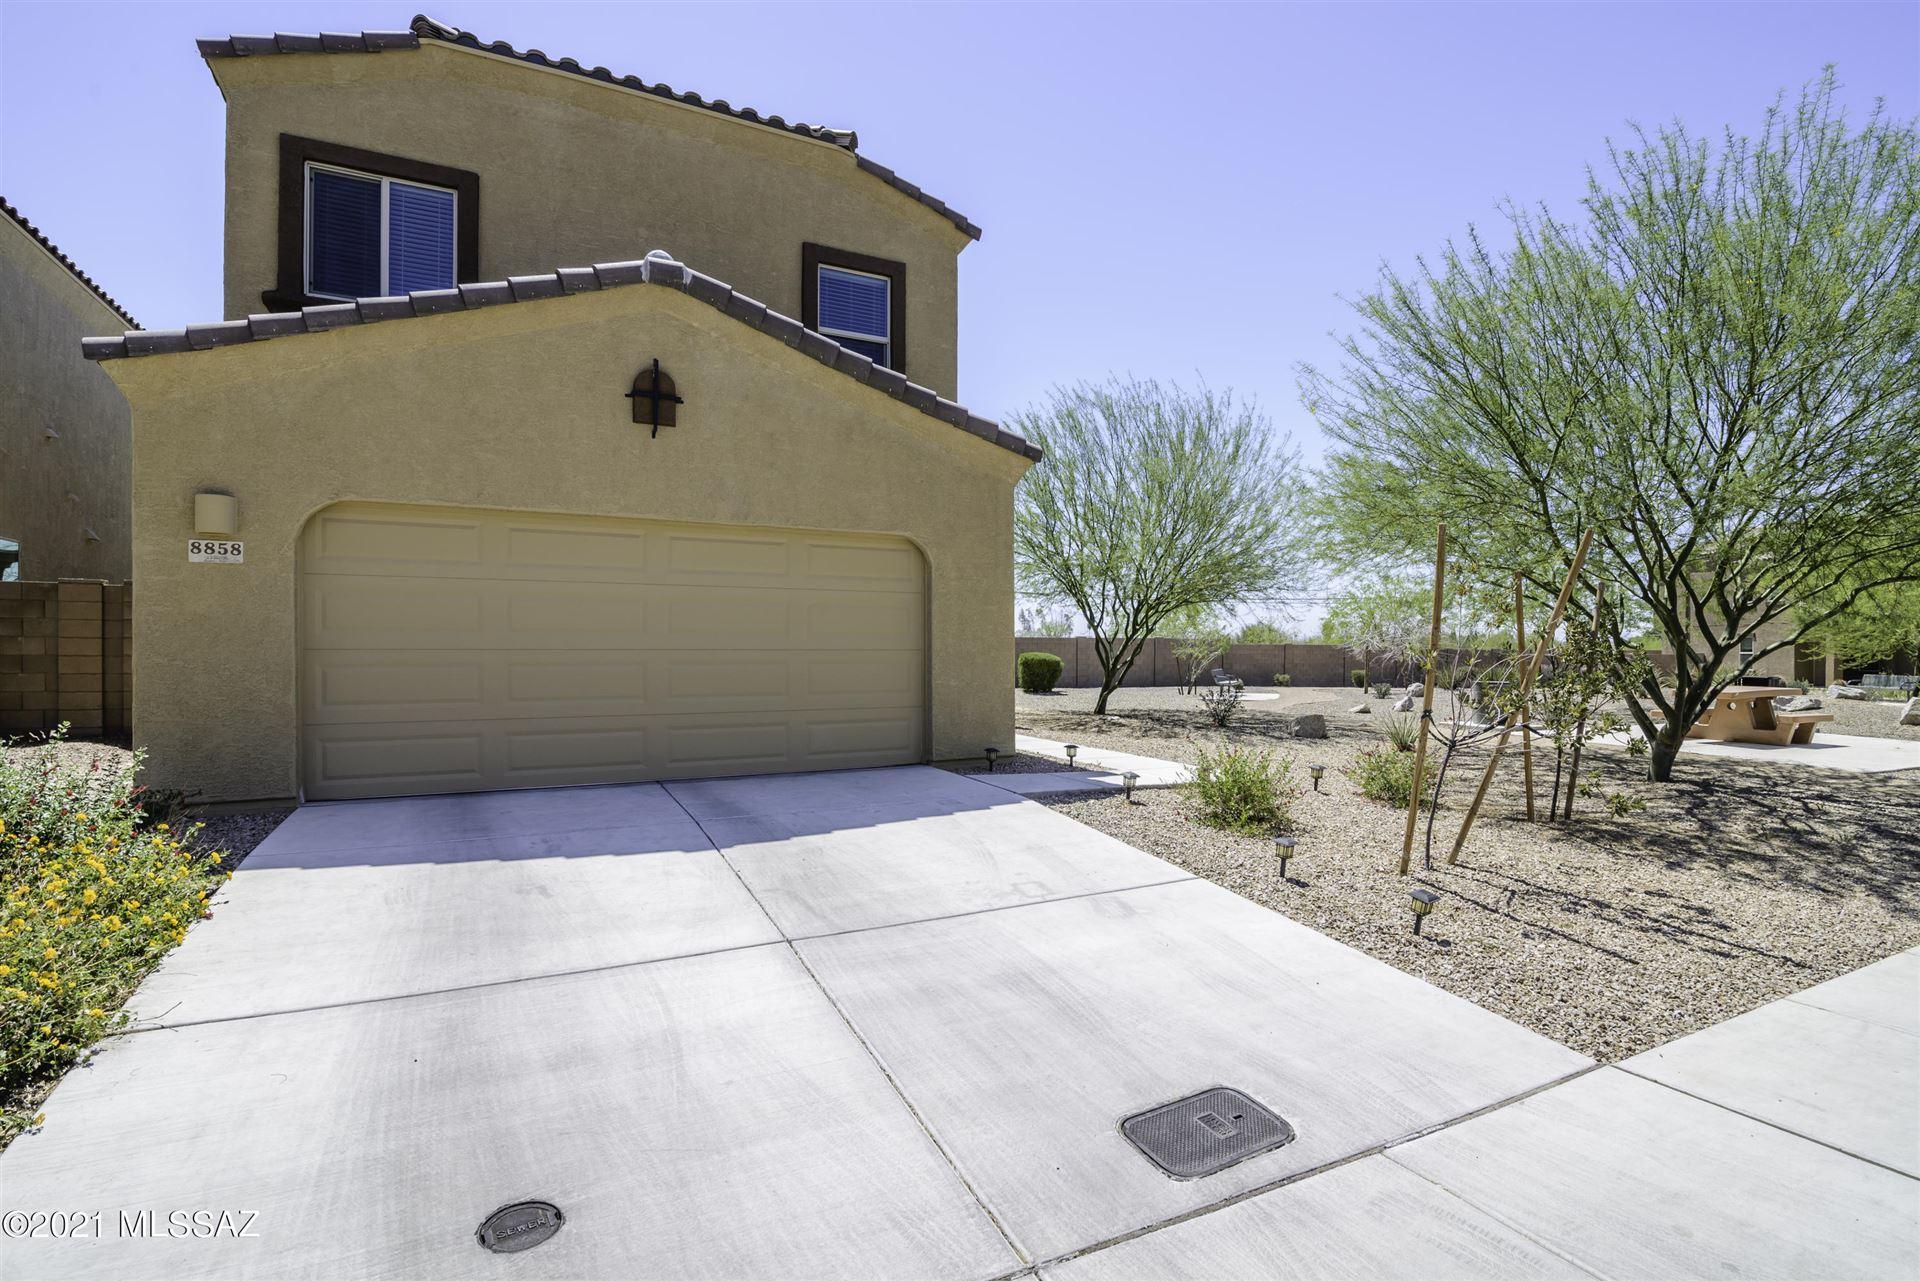 8858 E Abrams Loop, Tucson, AZ 85710 - MLS#: 22109055